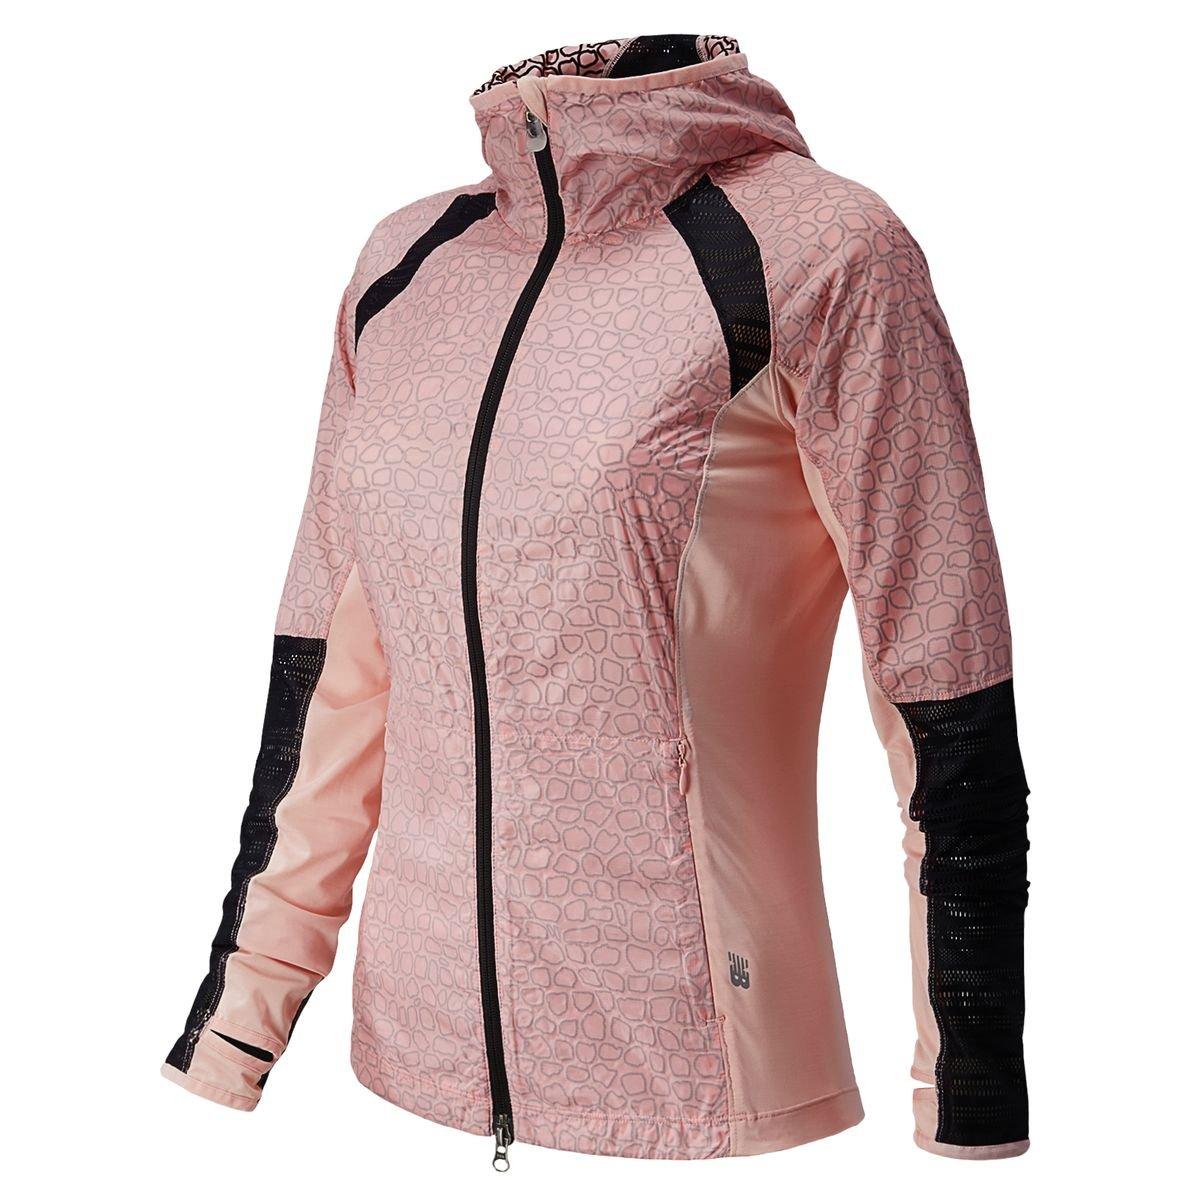 New Balance Women's Performance Jacket